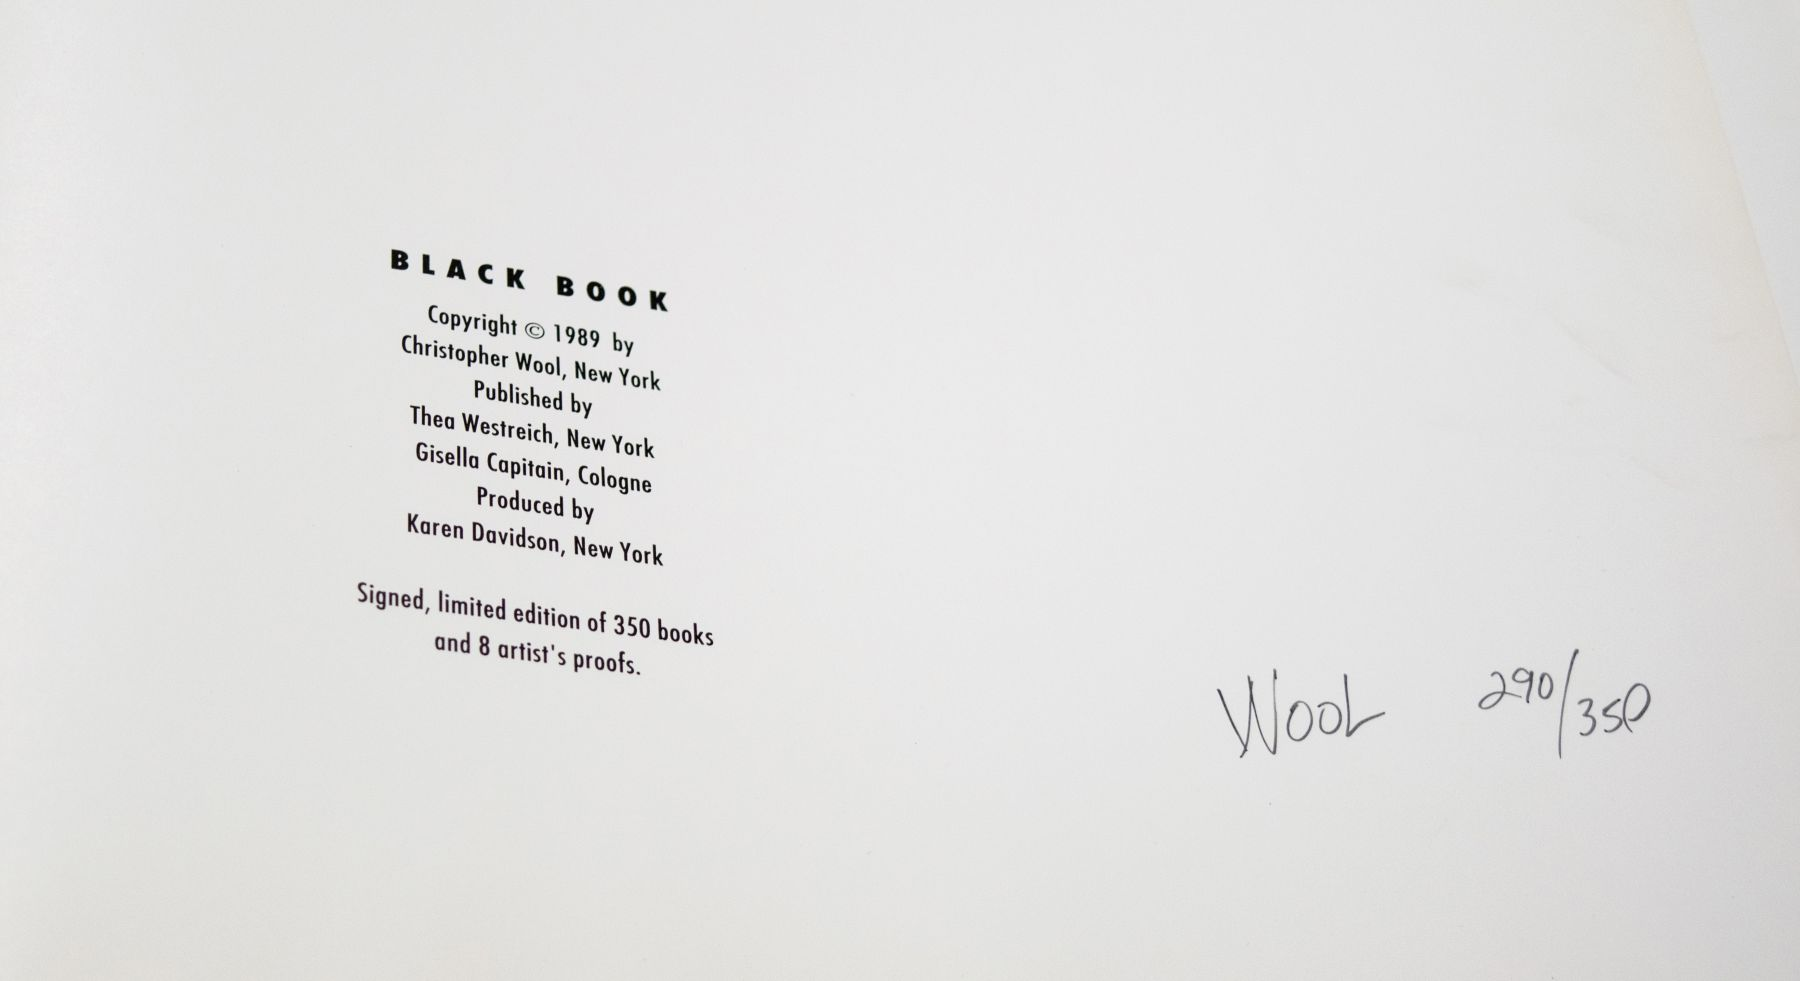 Christopher Wool Black Book, 1989